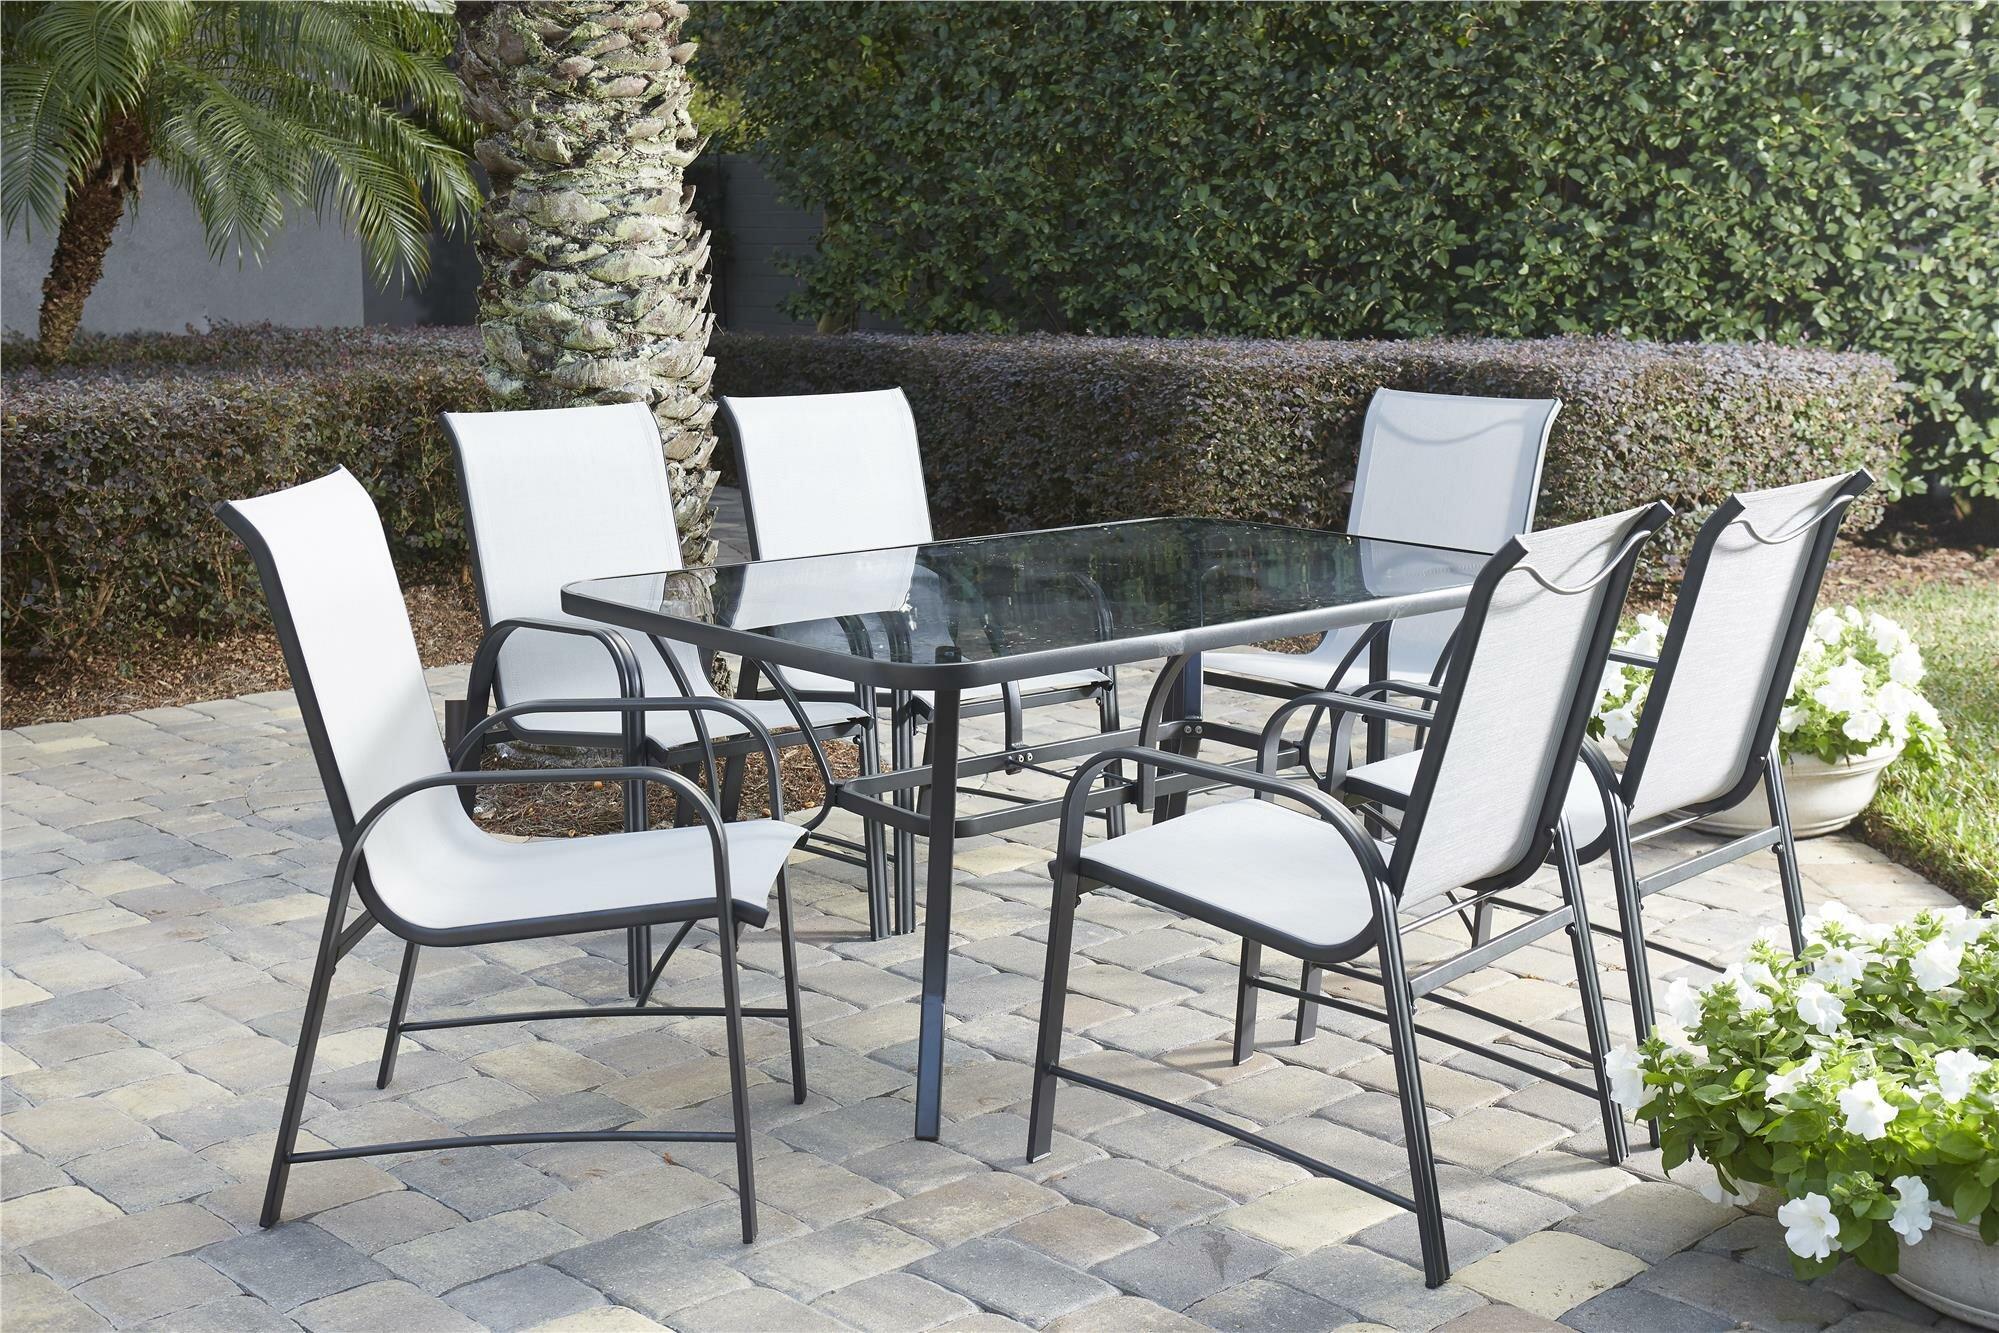 & Ebern Designs Osprey 7 Piece Patio Dining Set u0026 Reviews   Wayfair